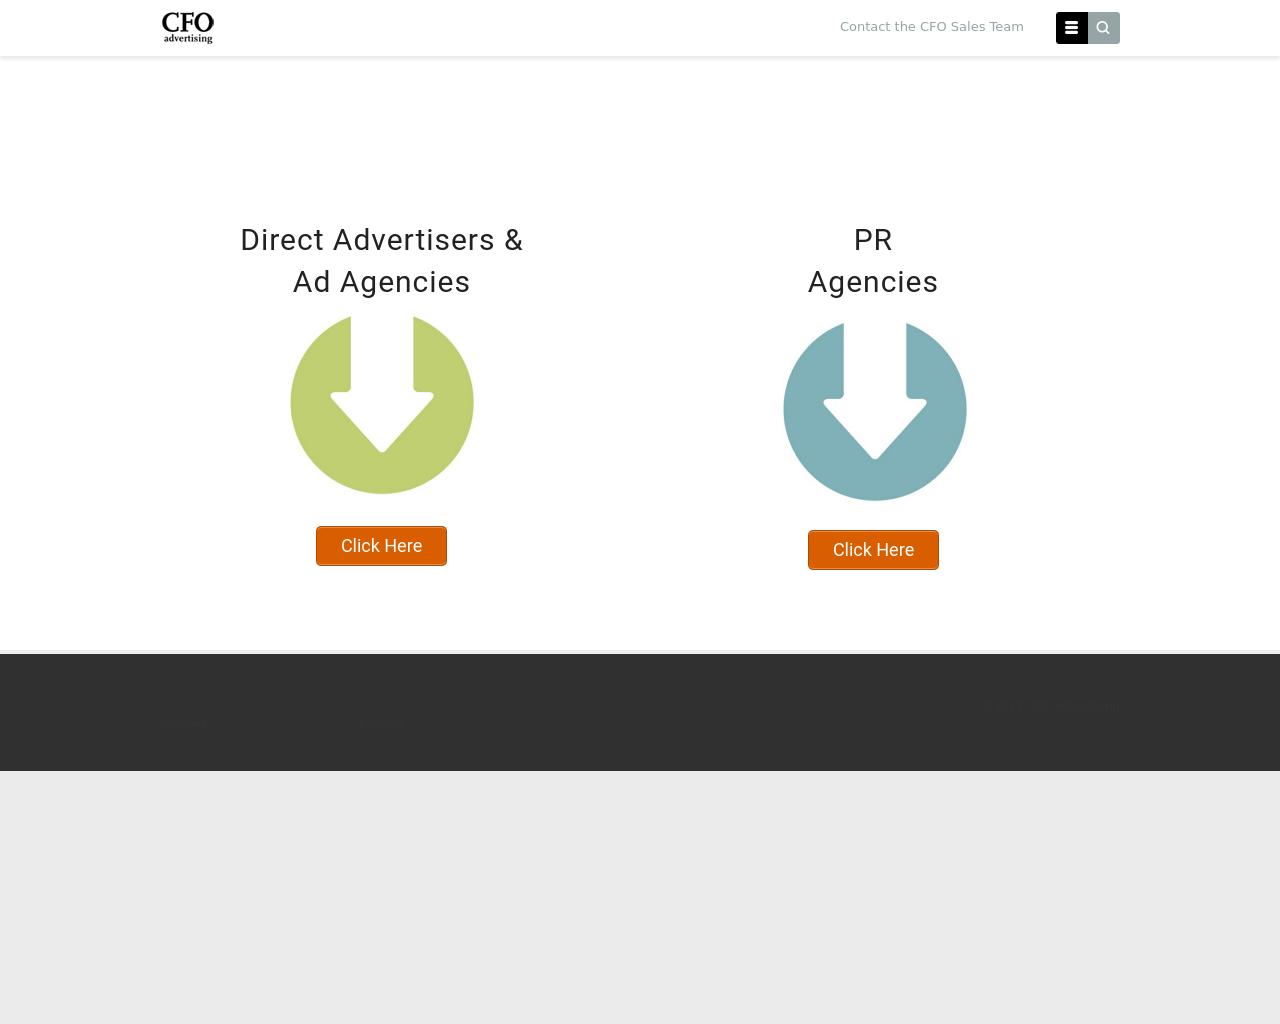 CFO-Publishing-Advertising-Reviews-Pricing